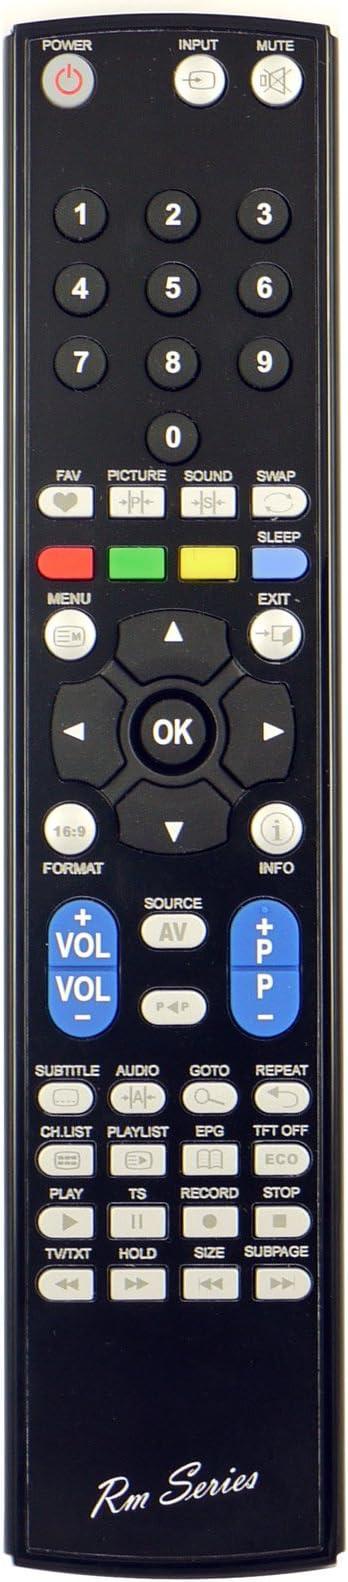 RM Series Reemplazo Mando a Distancia para BLU-SENS H305MCRST2B22PSP: Amazon.es: Electrónica